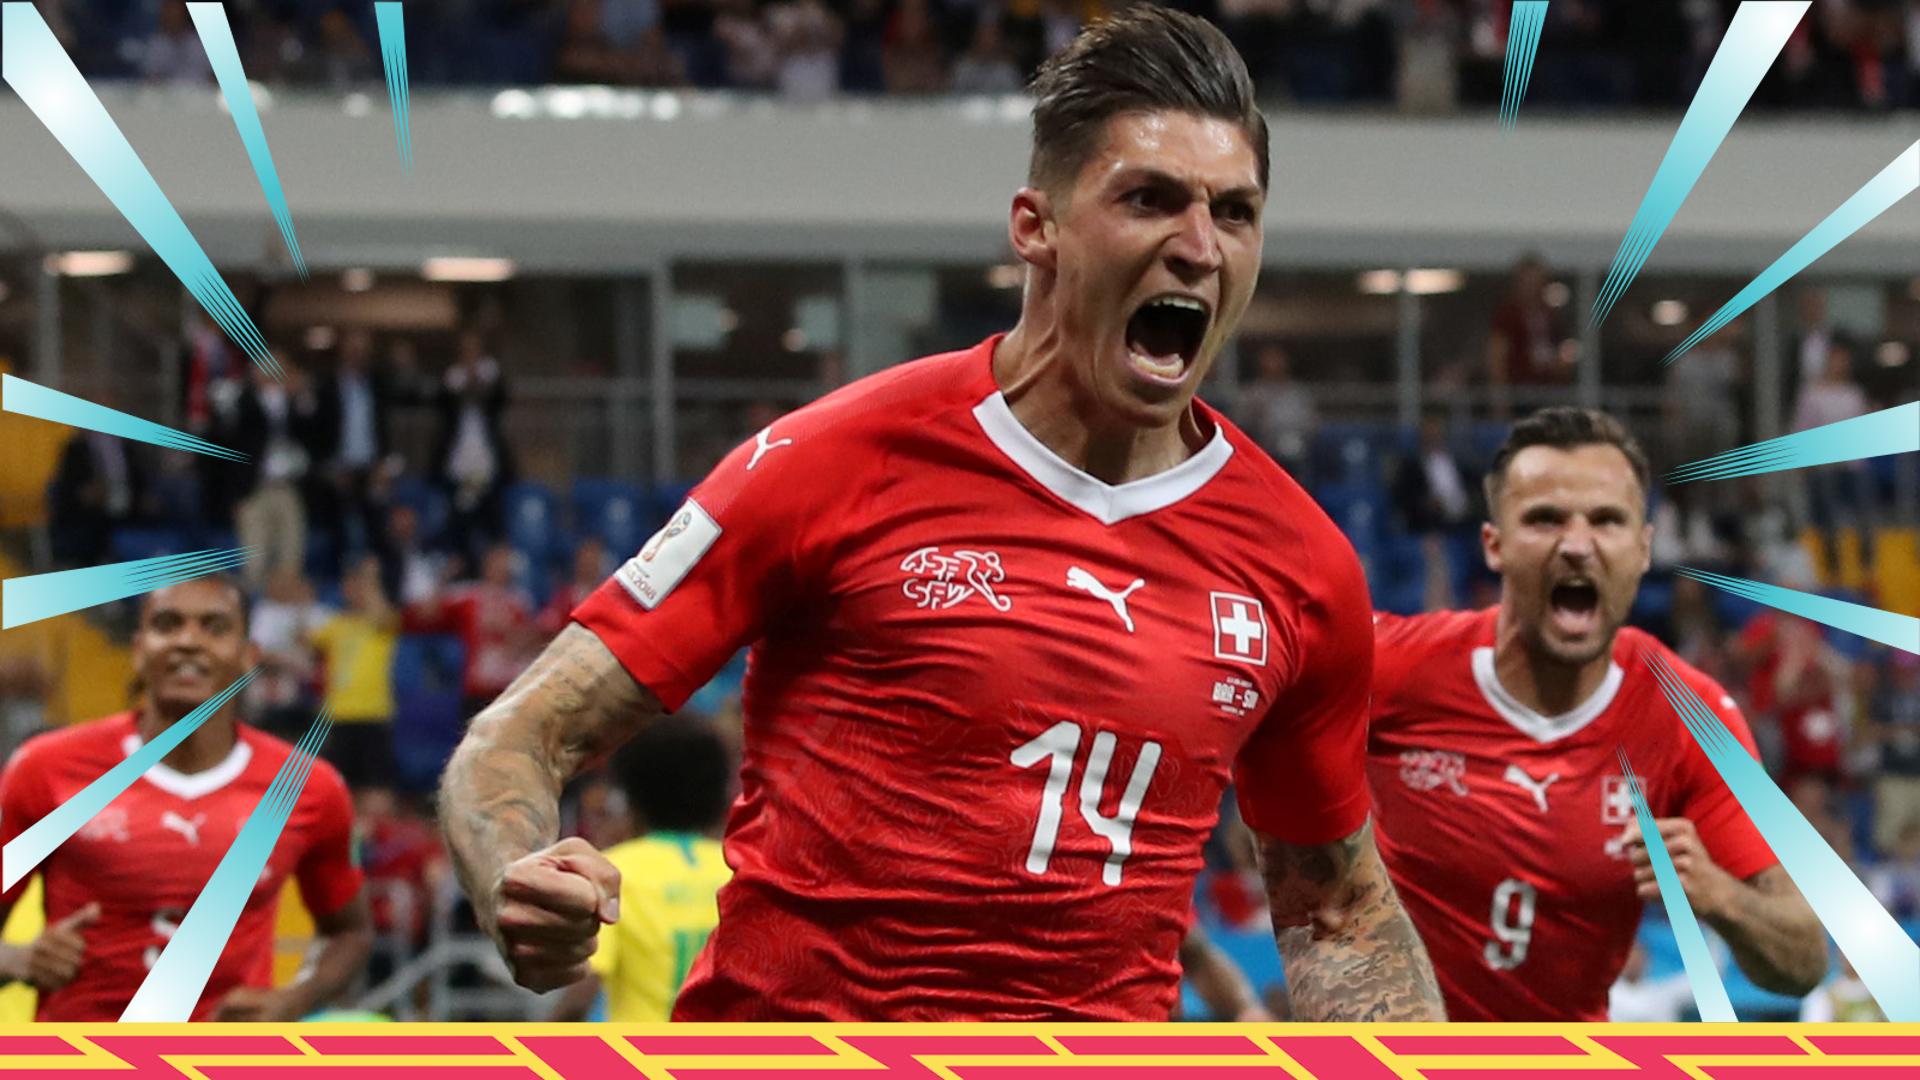 World Cup 2018: Brazil 1-1 Switzerland highlights